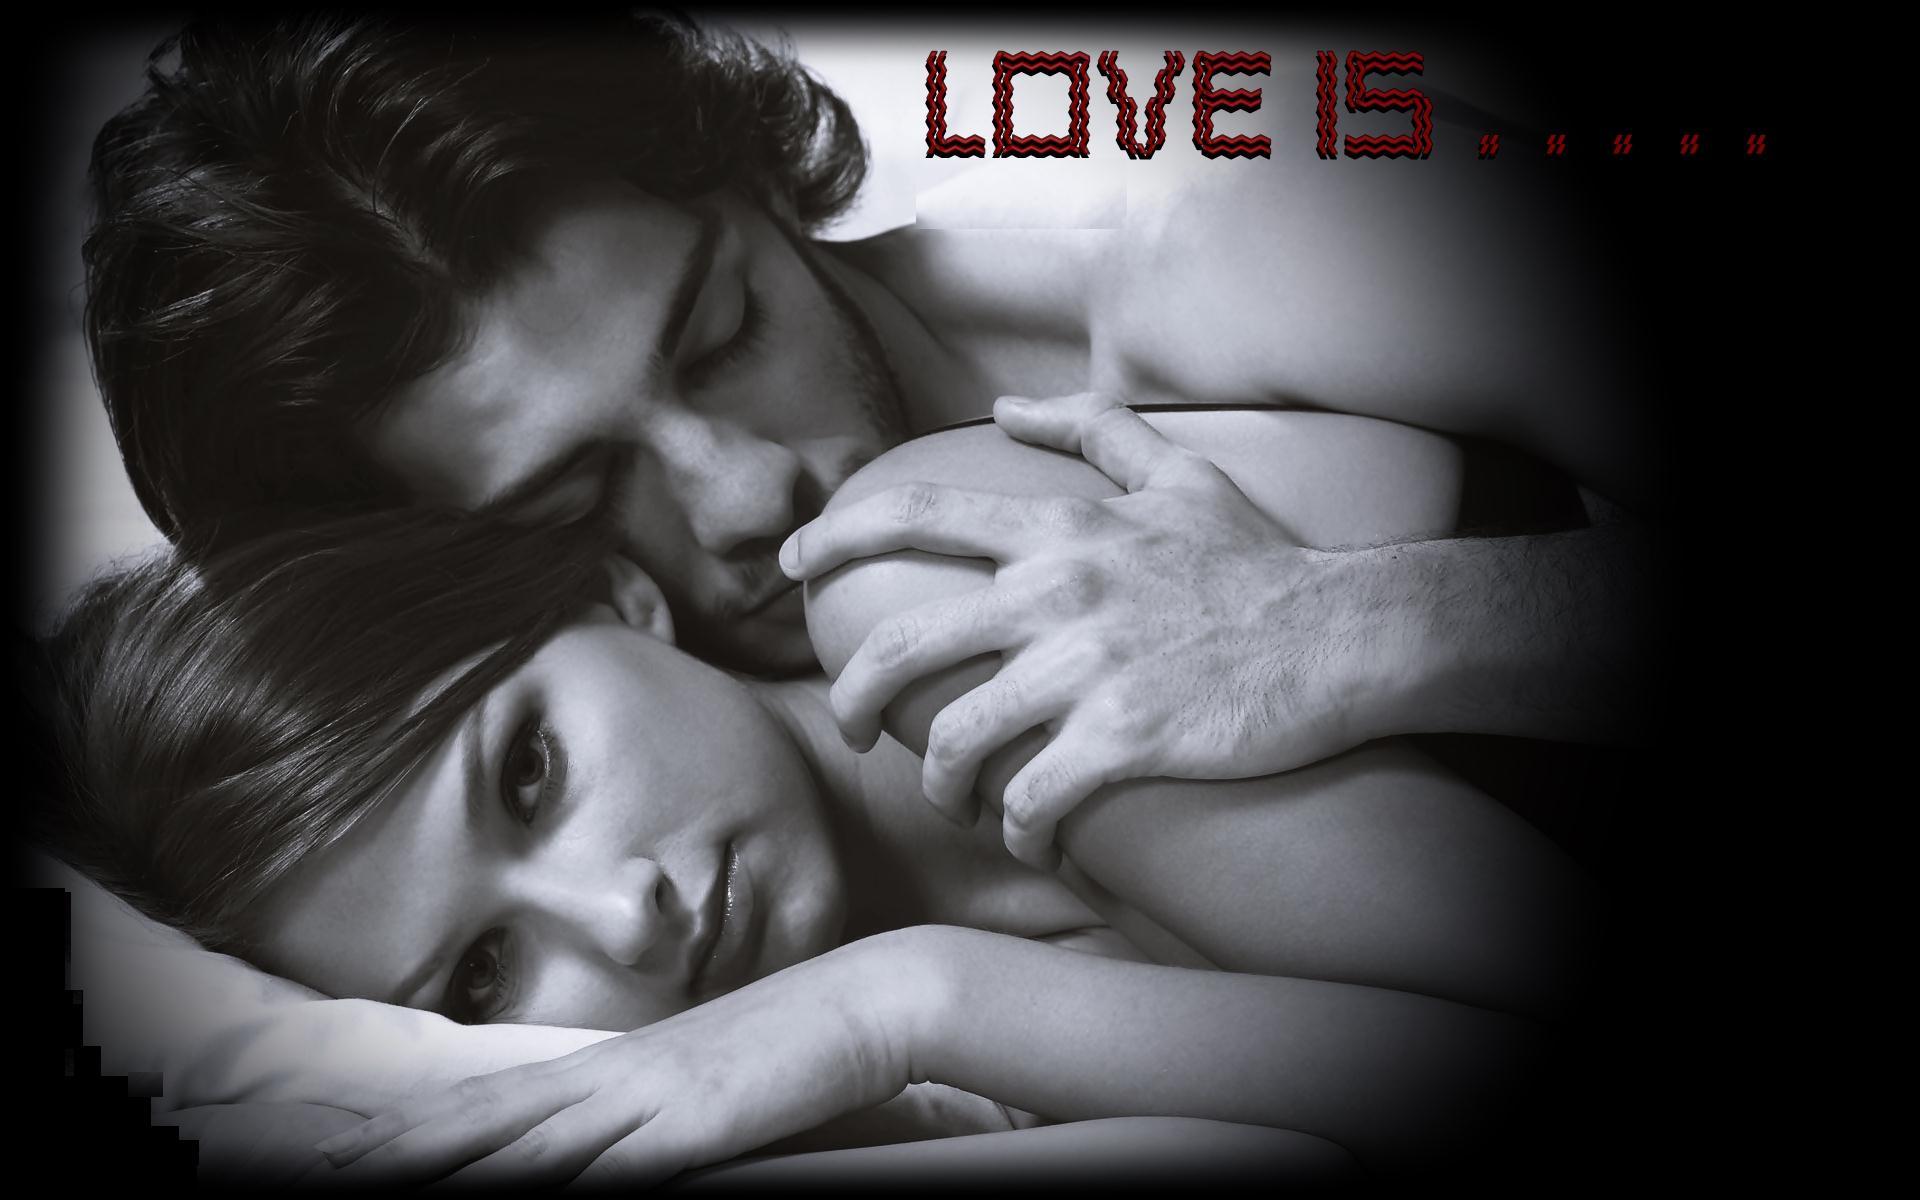 http://digilander.libero.it/cuoresolitario_2000/noivoi33.jpg